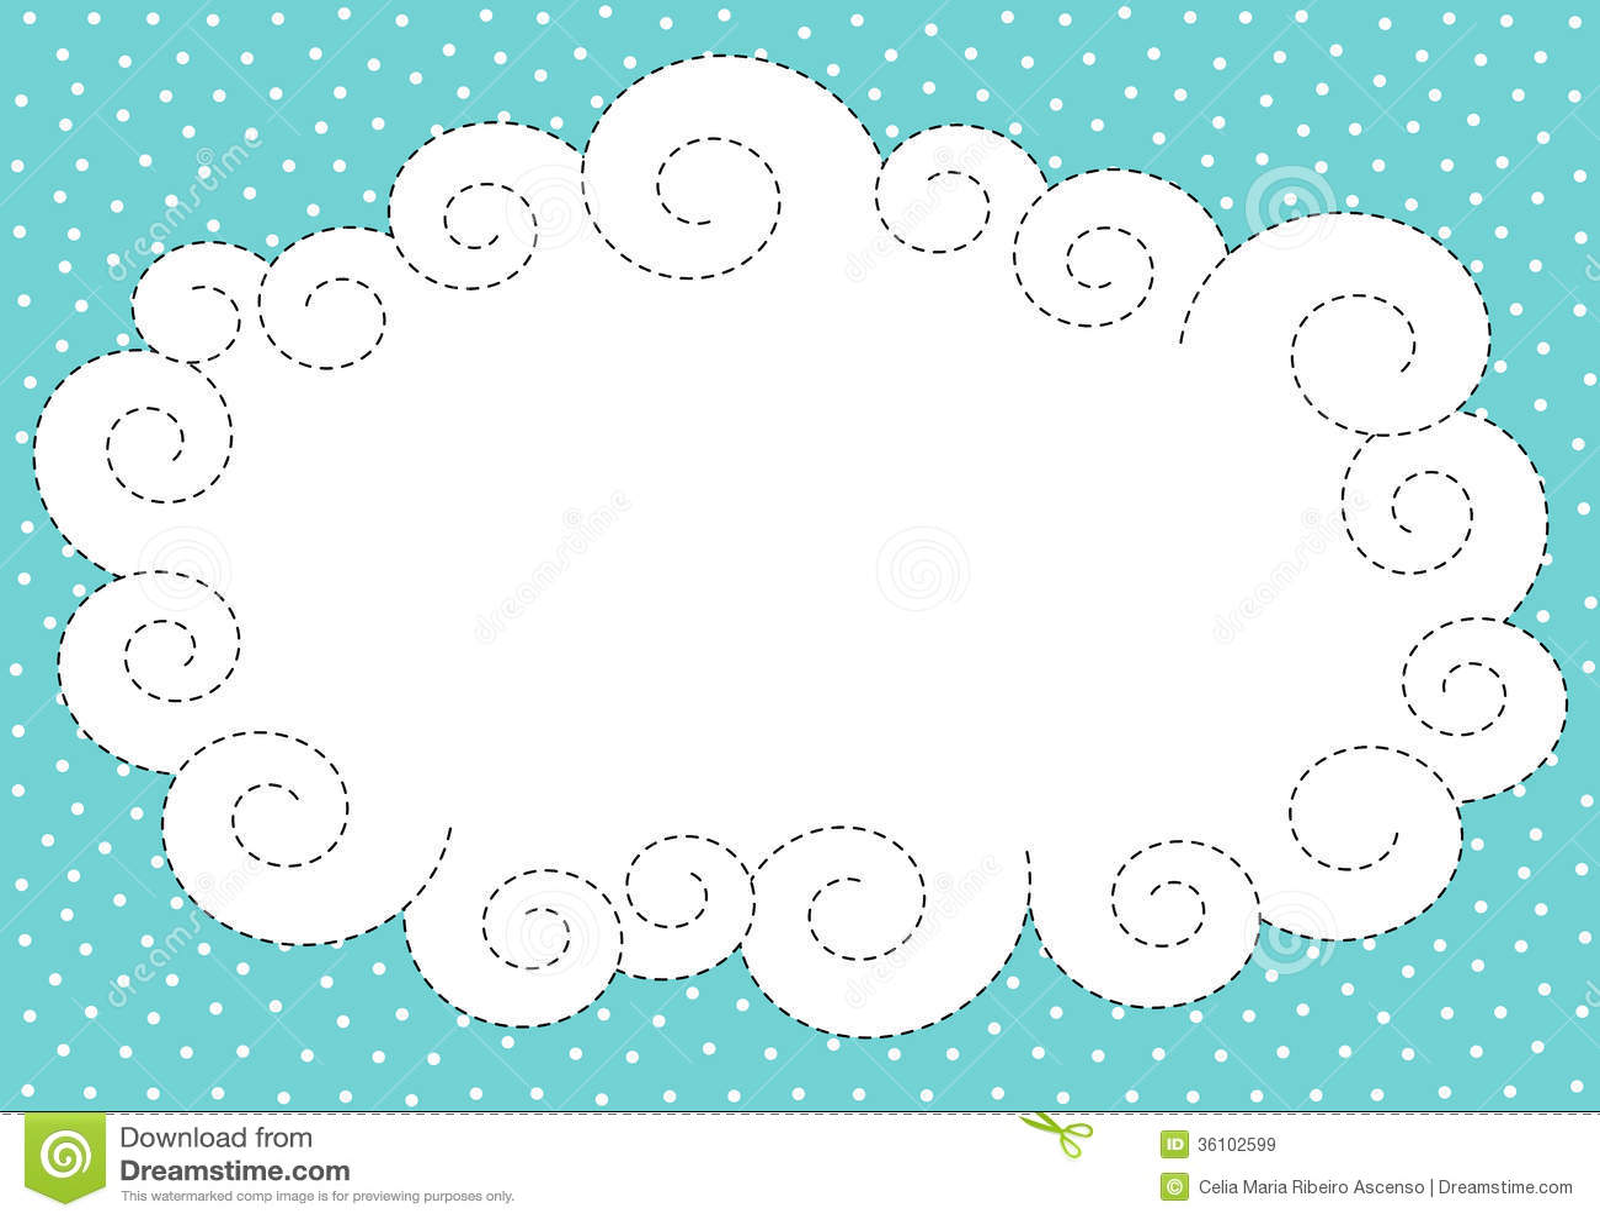 Cloud And Snow Border Frame Stock Illustration - Illustration of ...